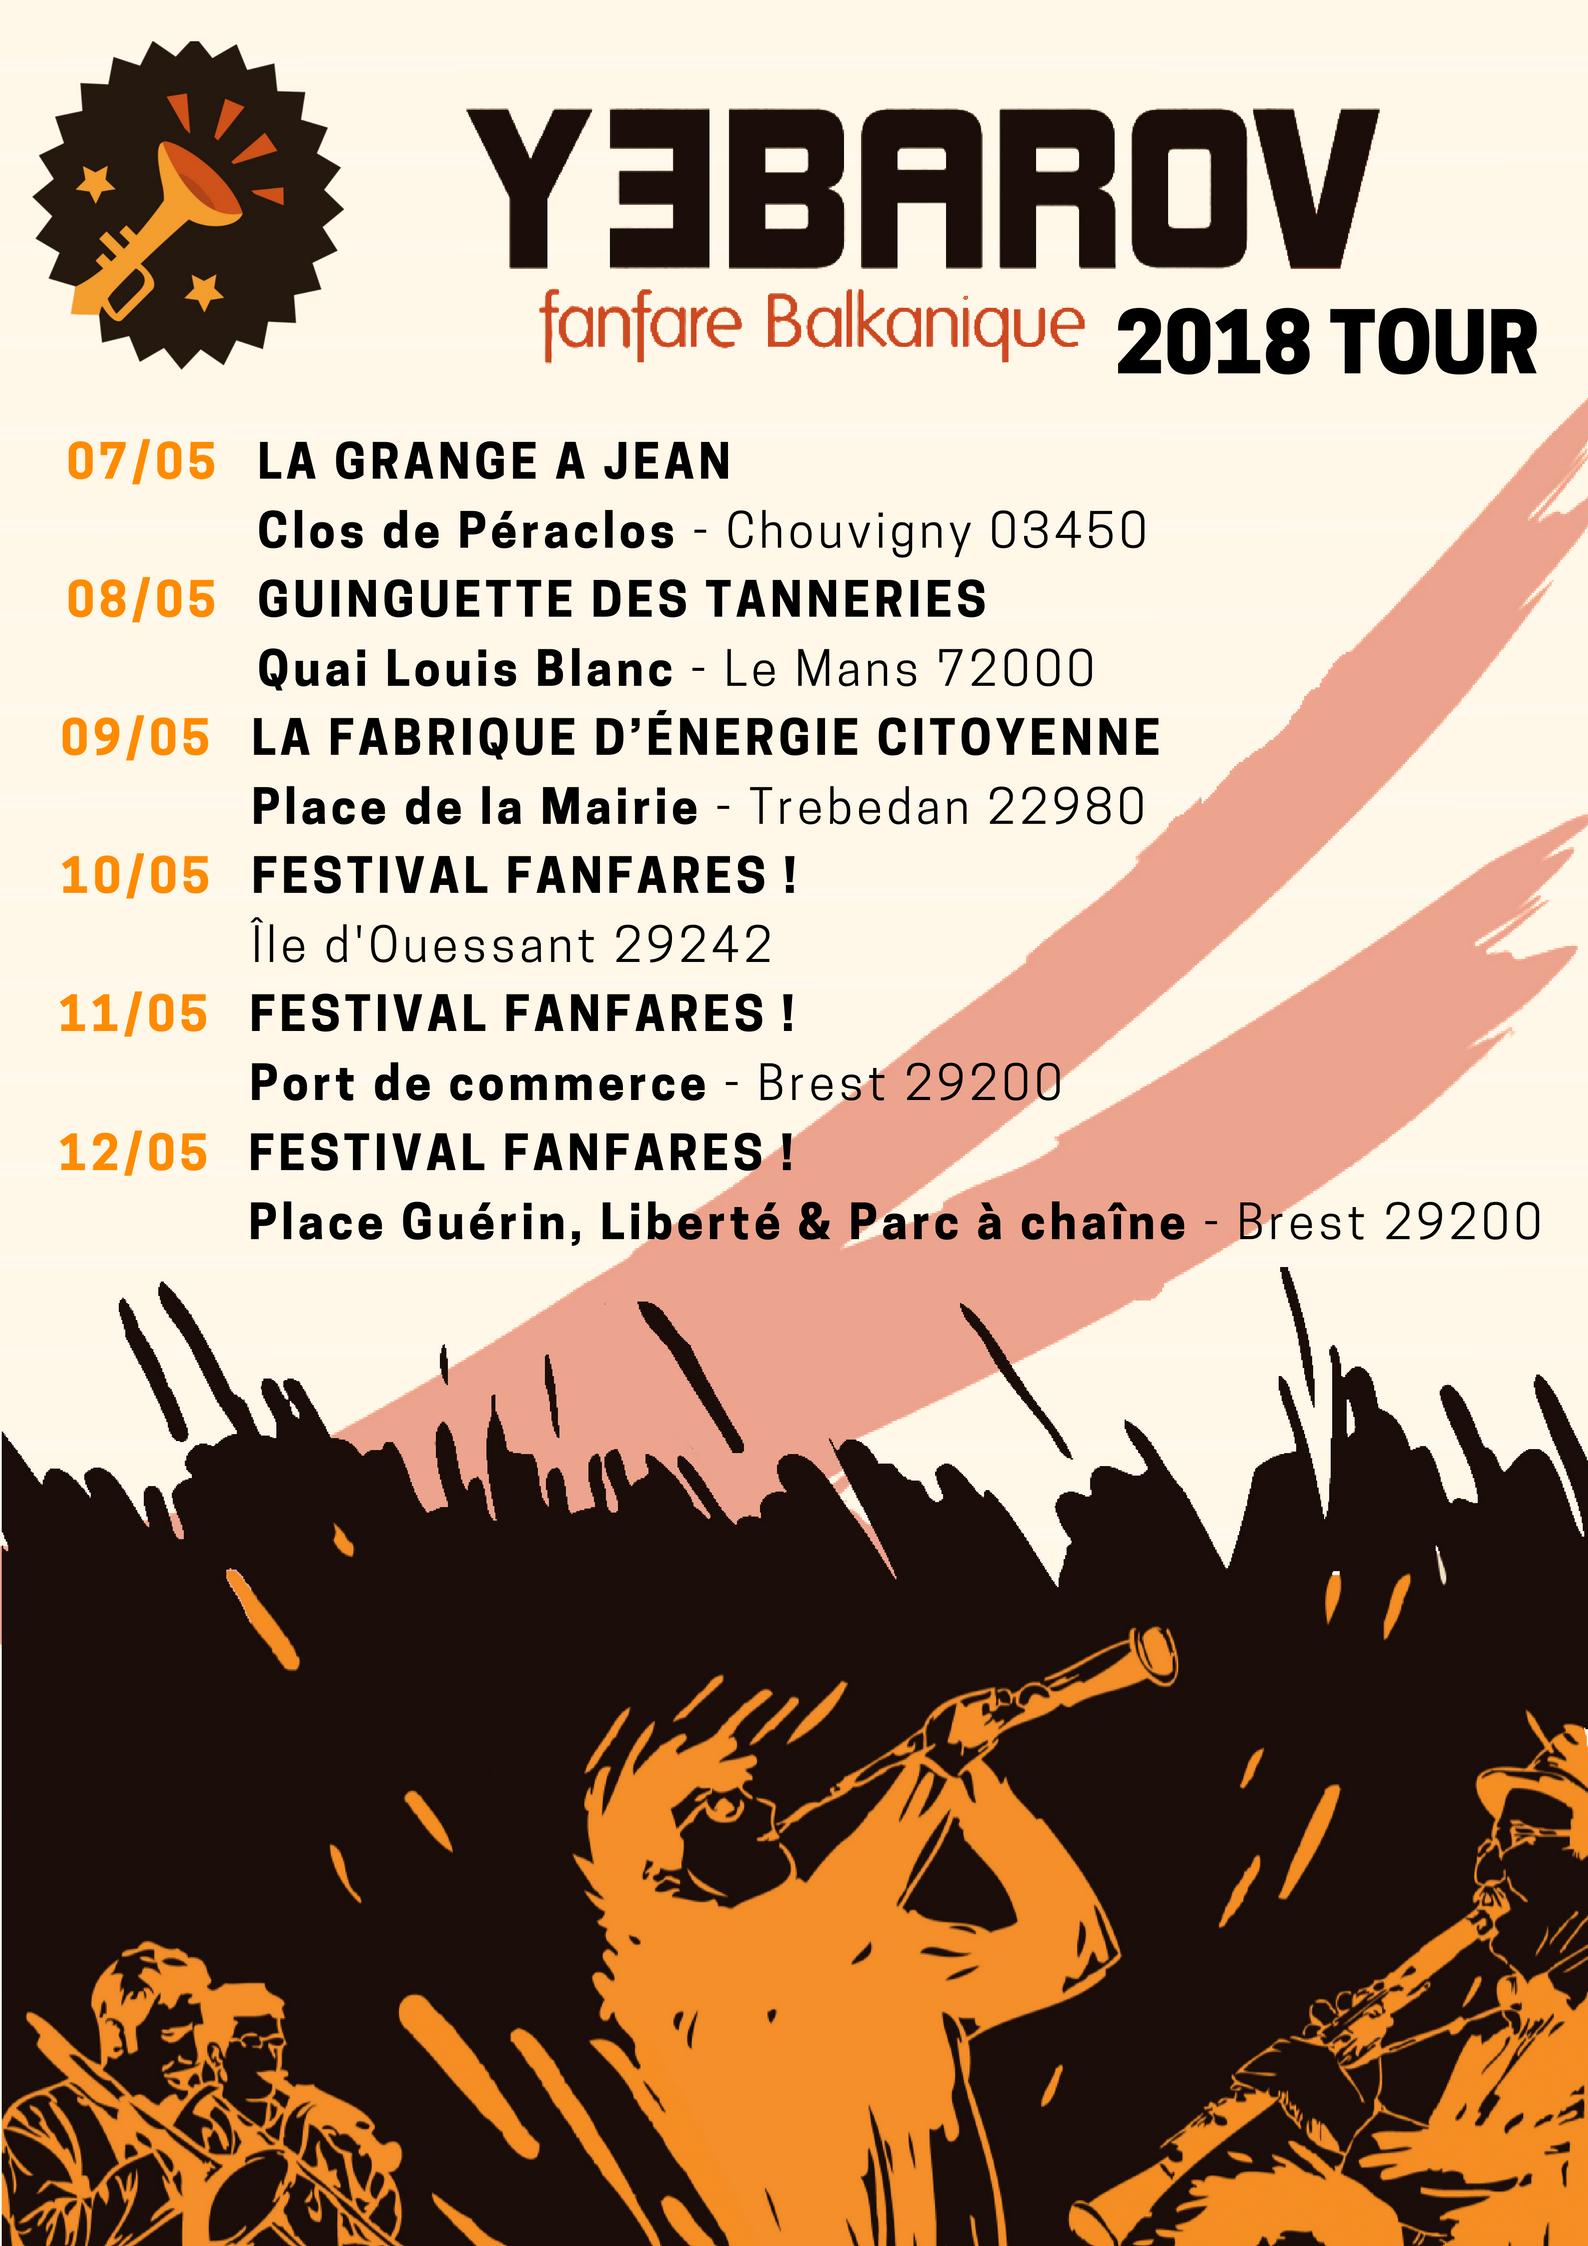 Yeb Tour 2018